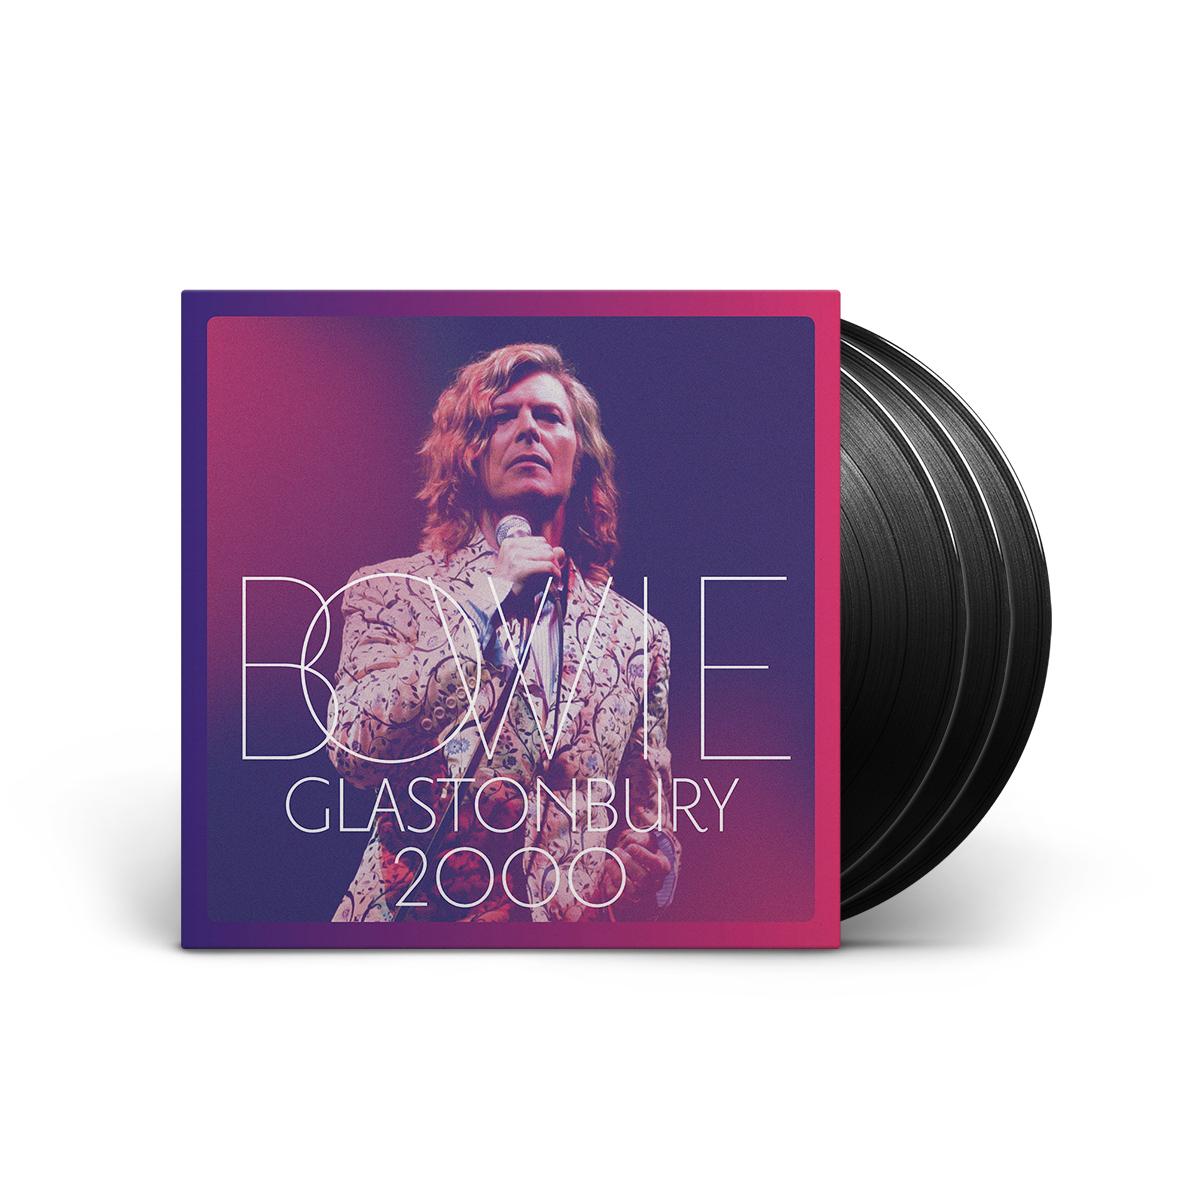 David Bowie - Glastonbury 2000 3 LP Set